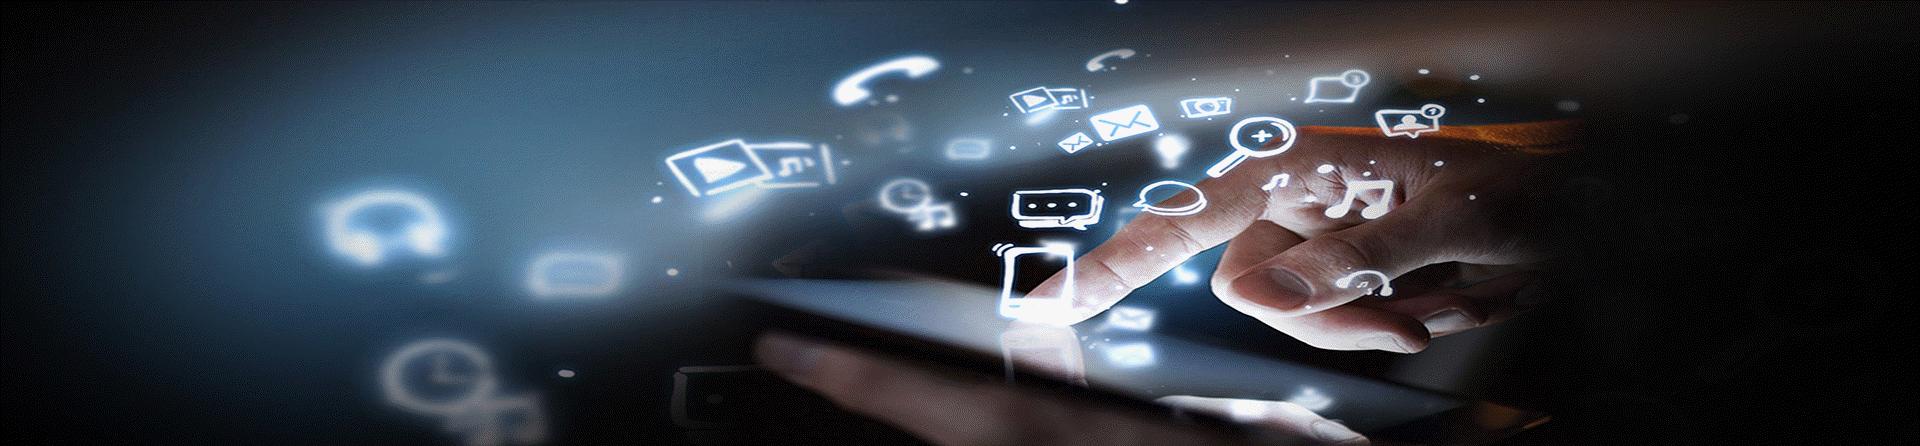 Mobile App Development Twapp Media Waterford